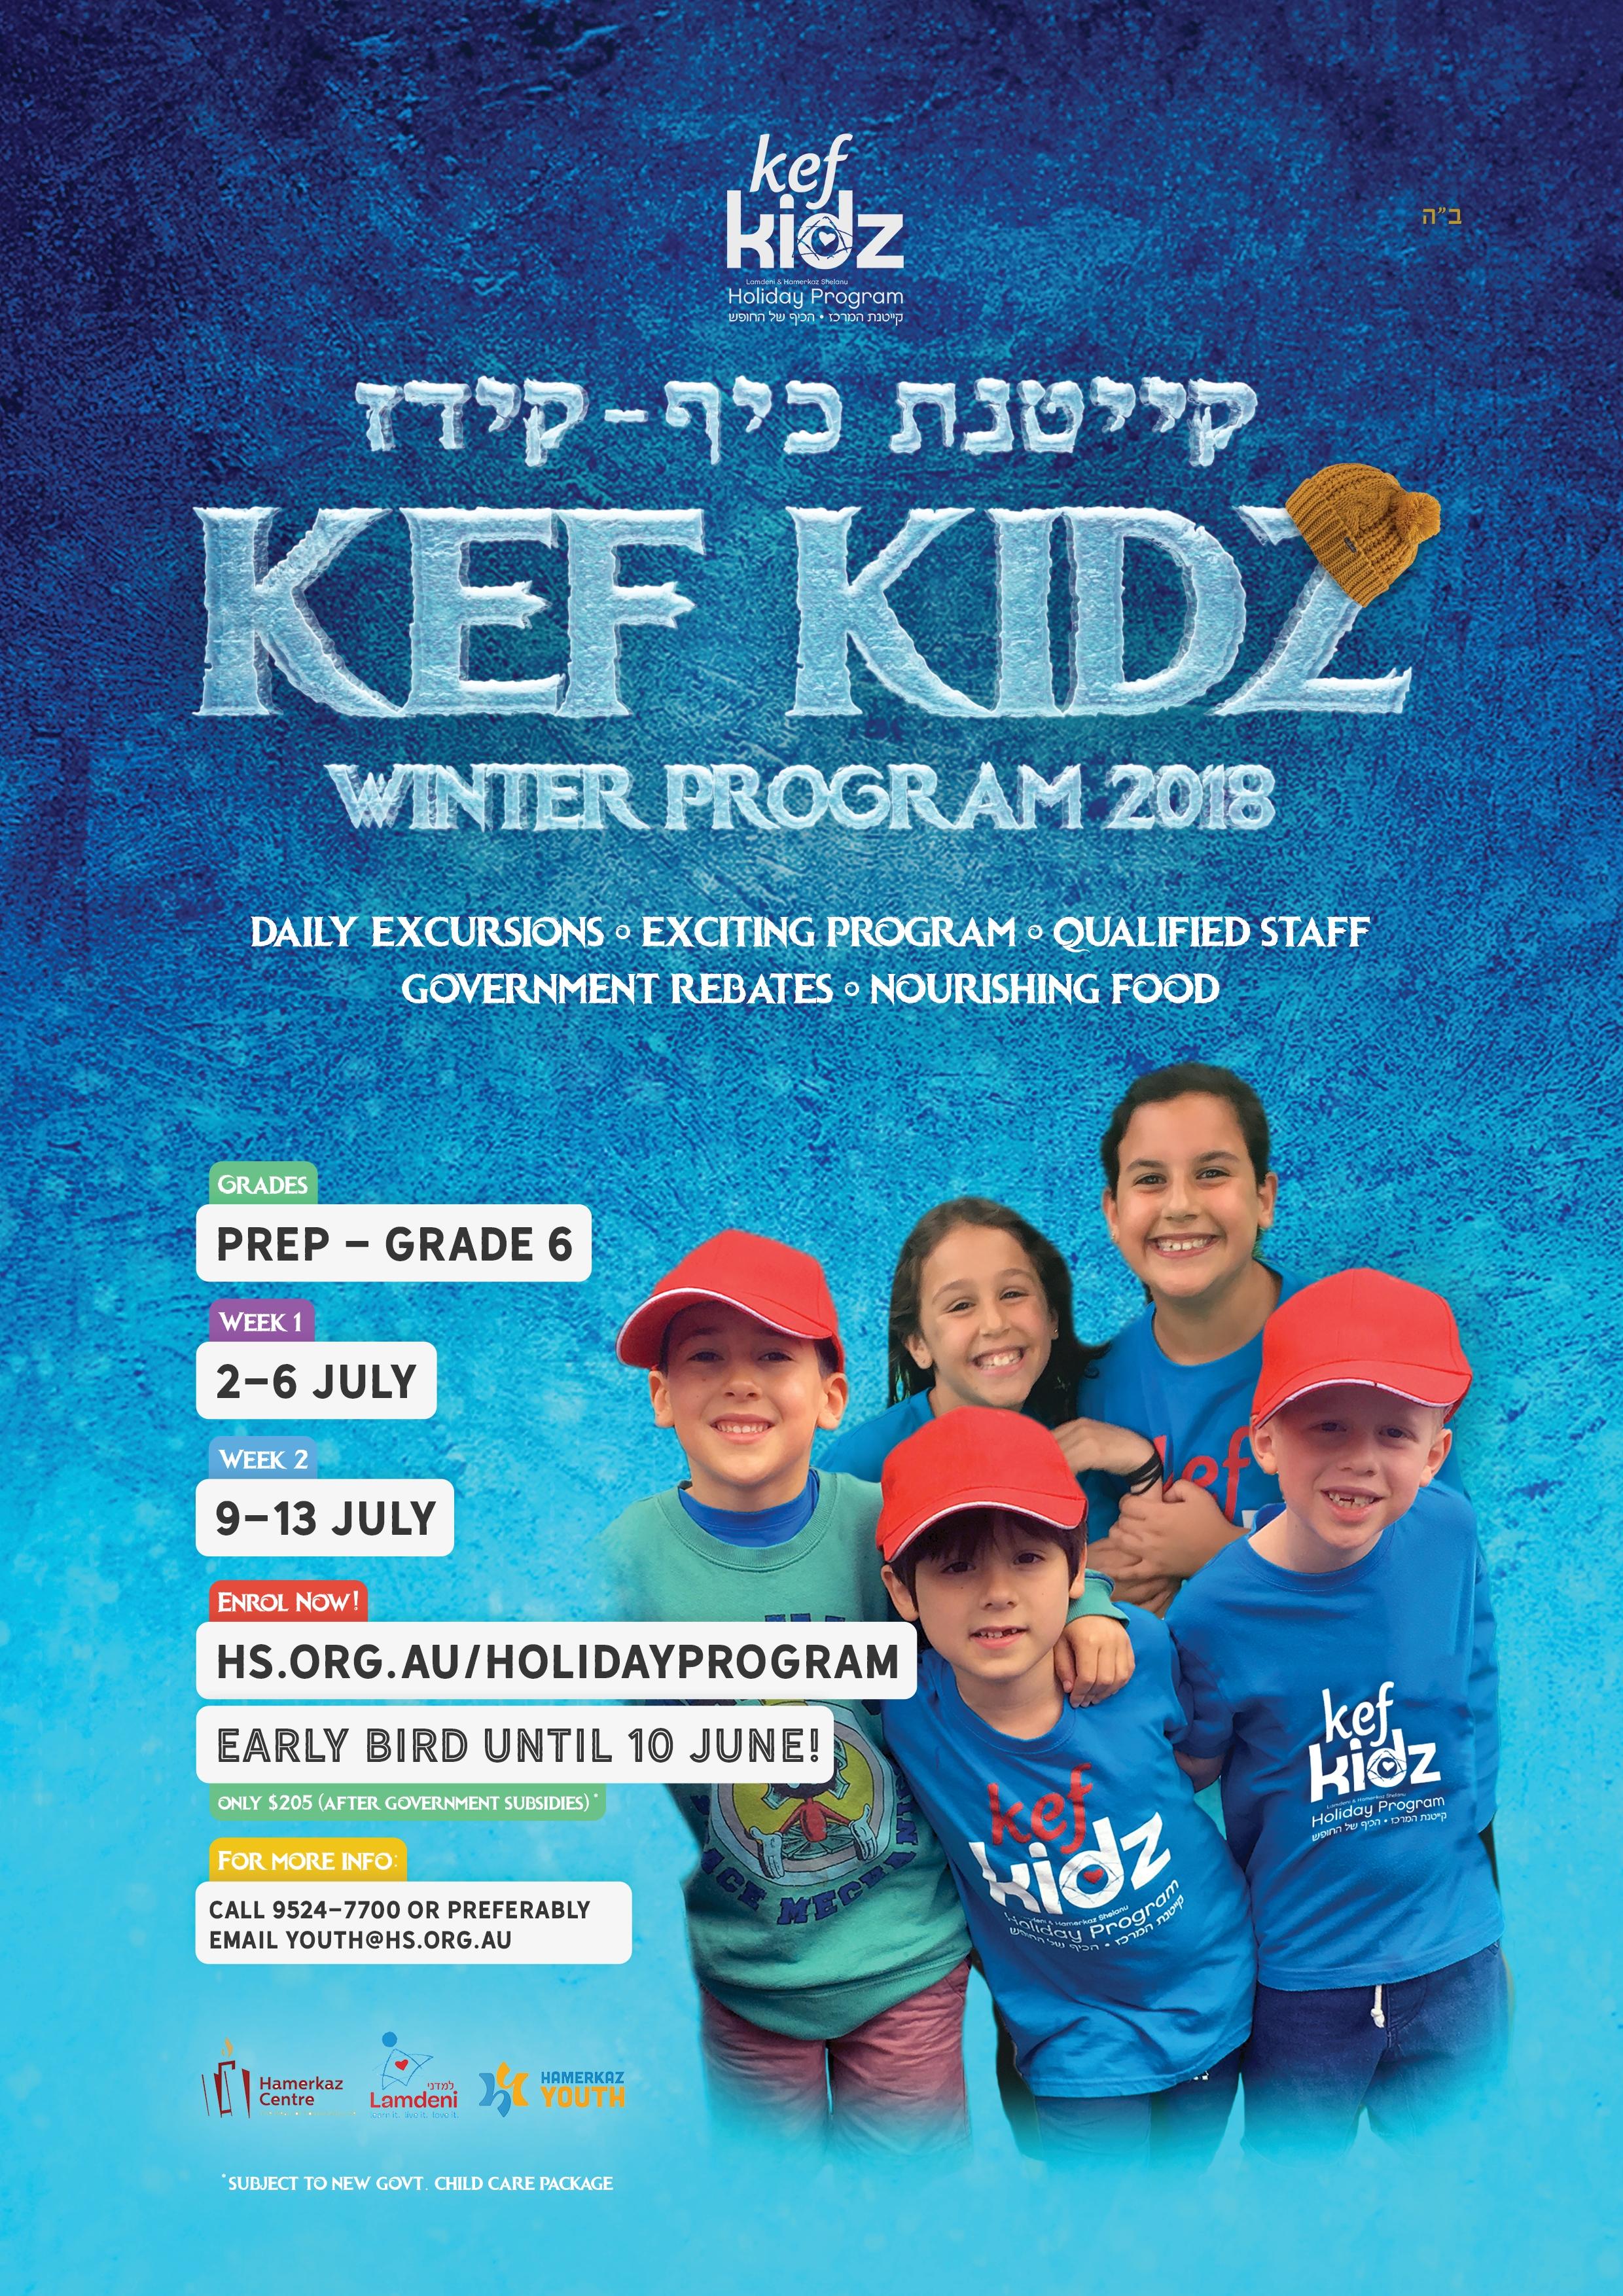 Kef Kidz July 2018 v3.1 digital.jpg